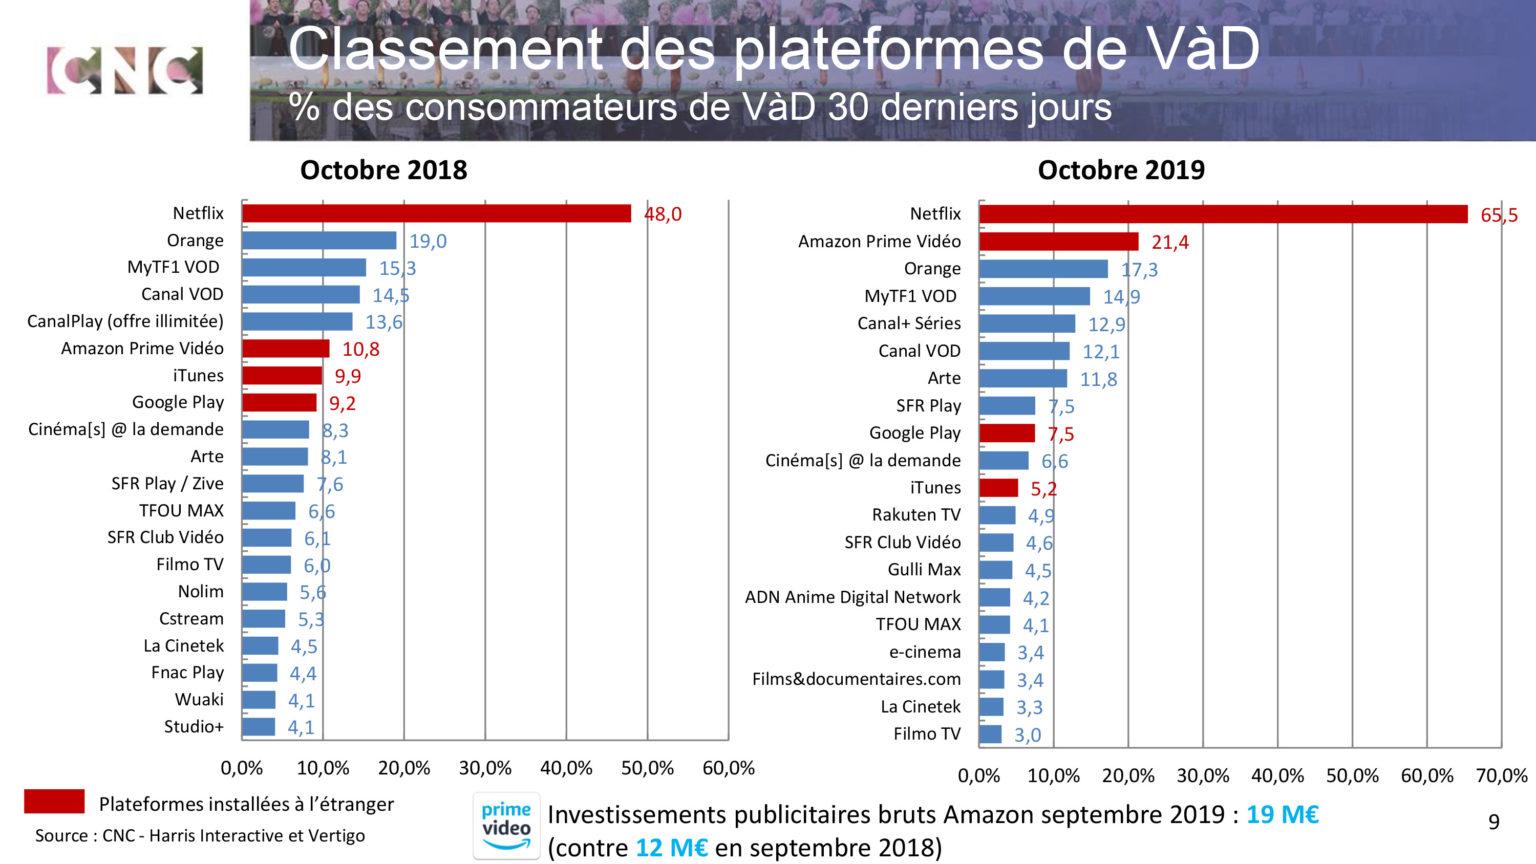 classement 2019 plateformes de VOD